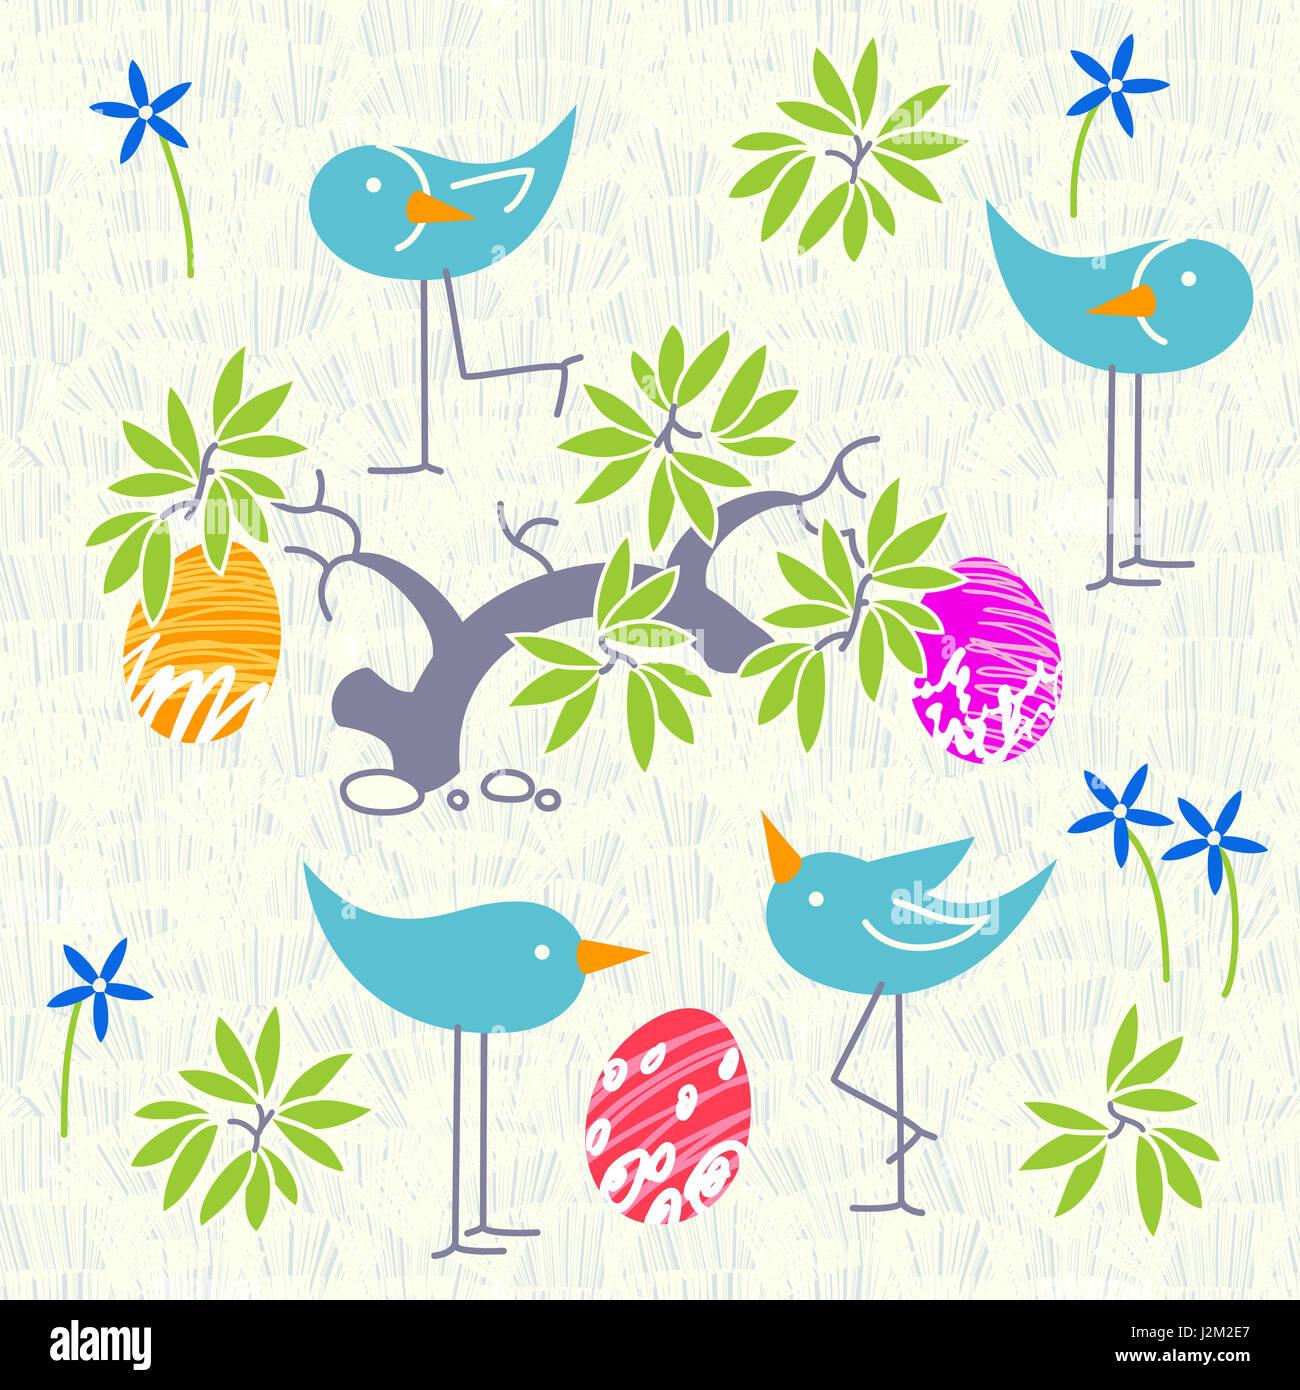 Cute Birds Baby Shower Invitation Card Design Layout